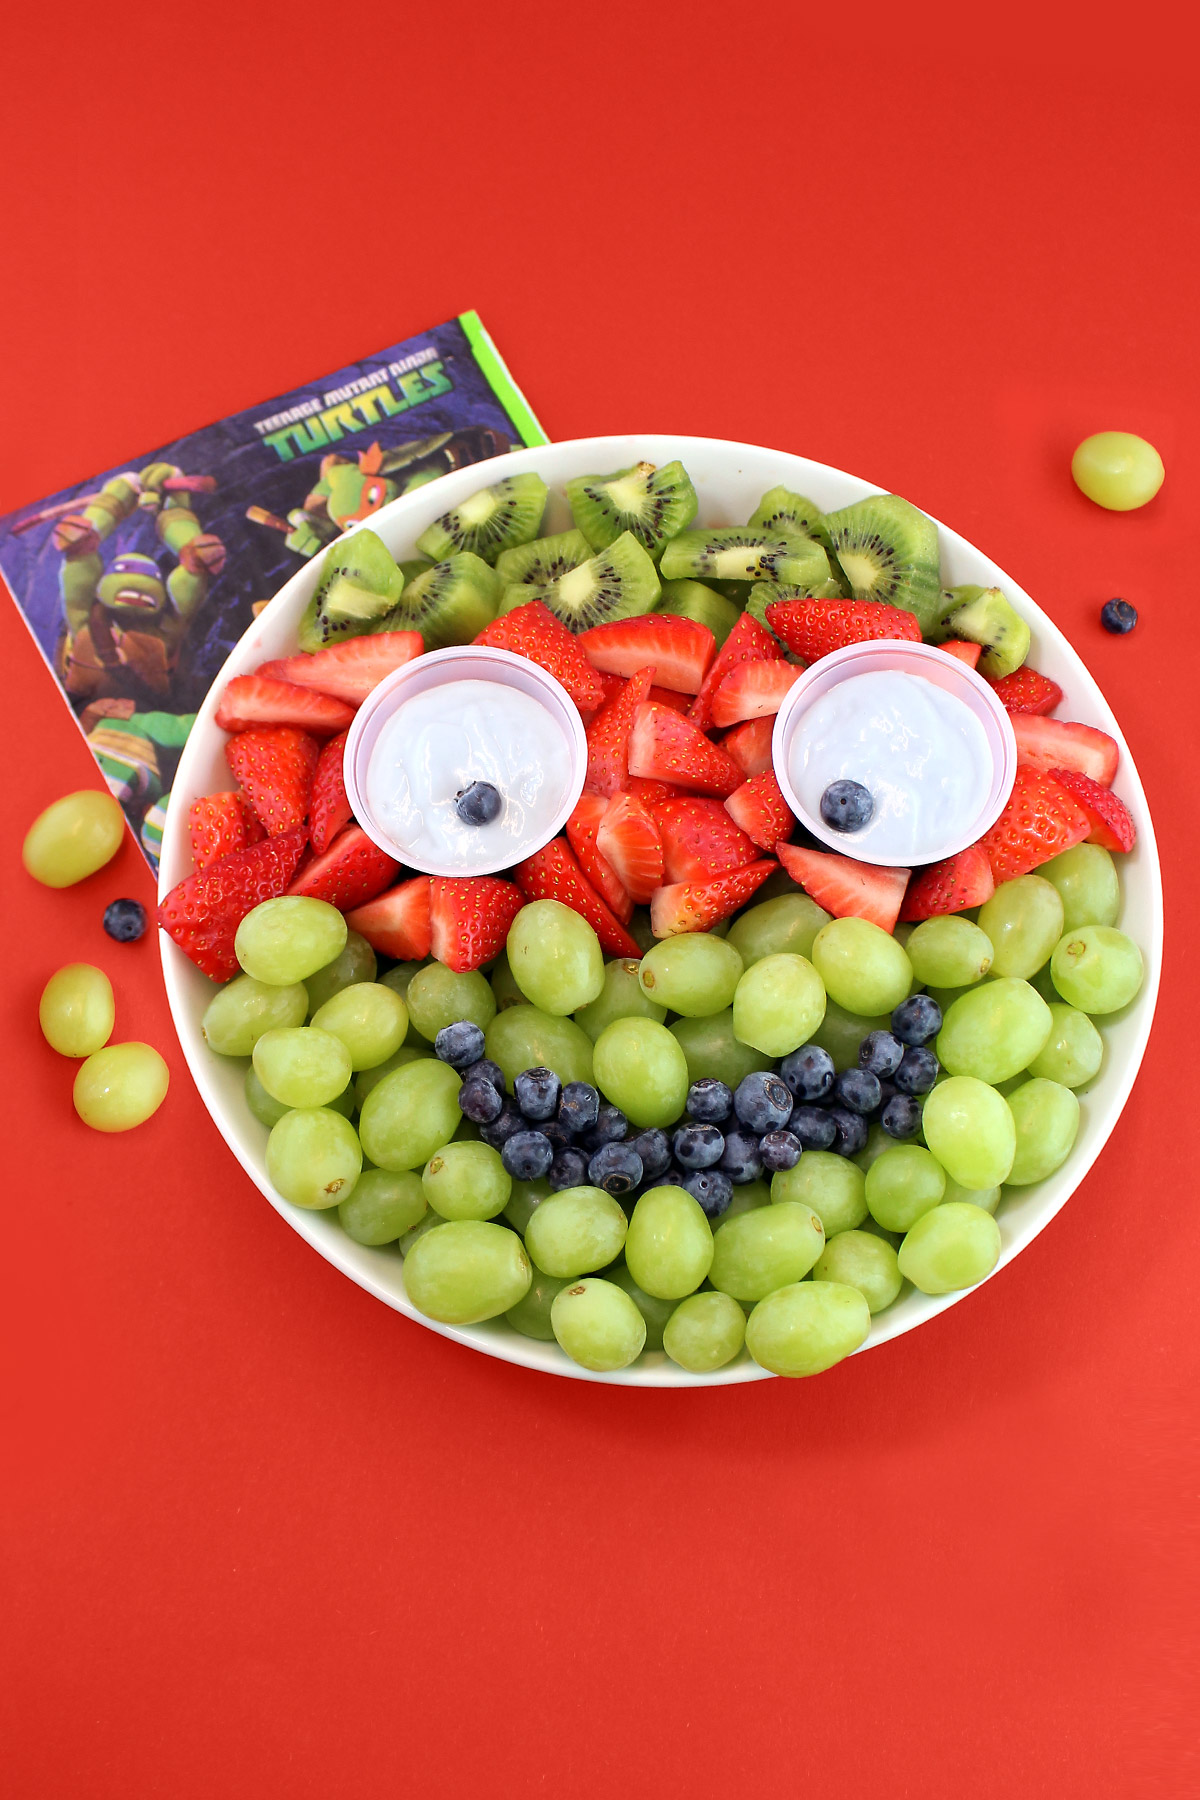 TMNT Fruity Face Fruit Platter Recipe